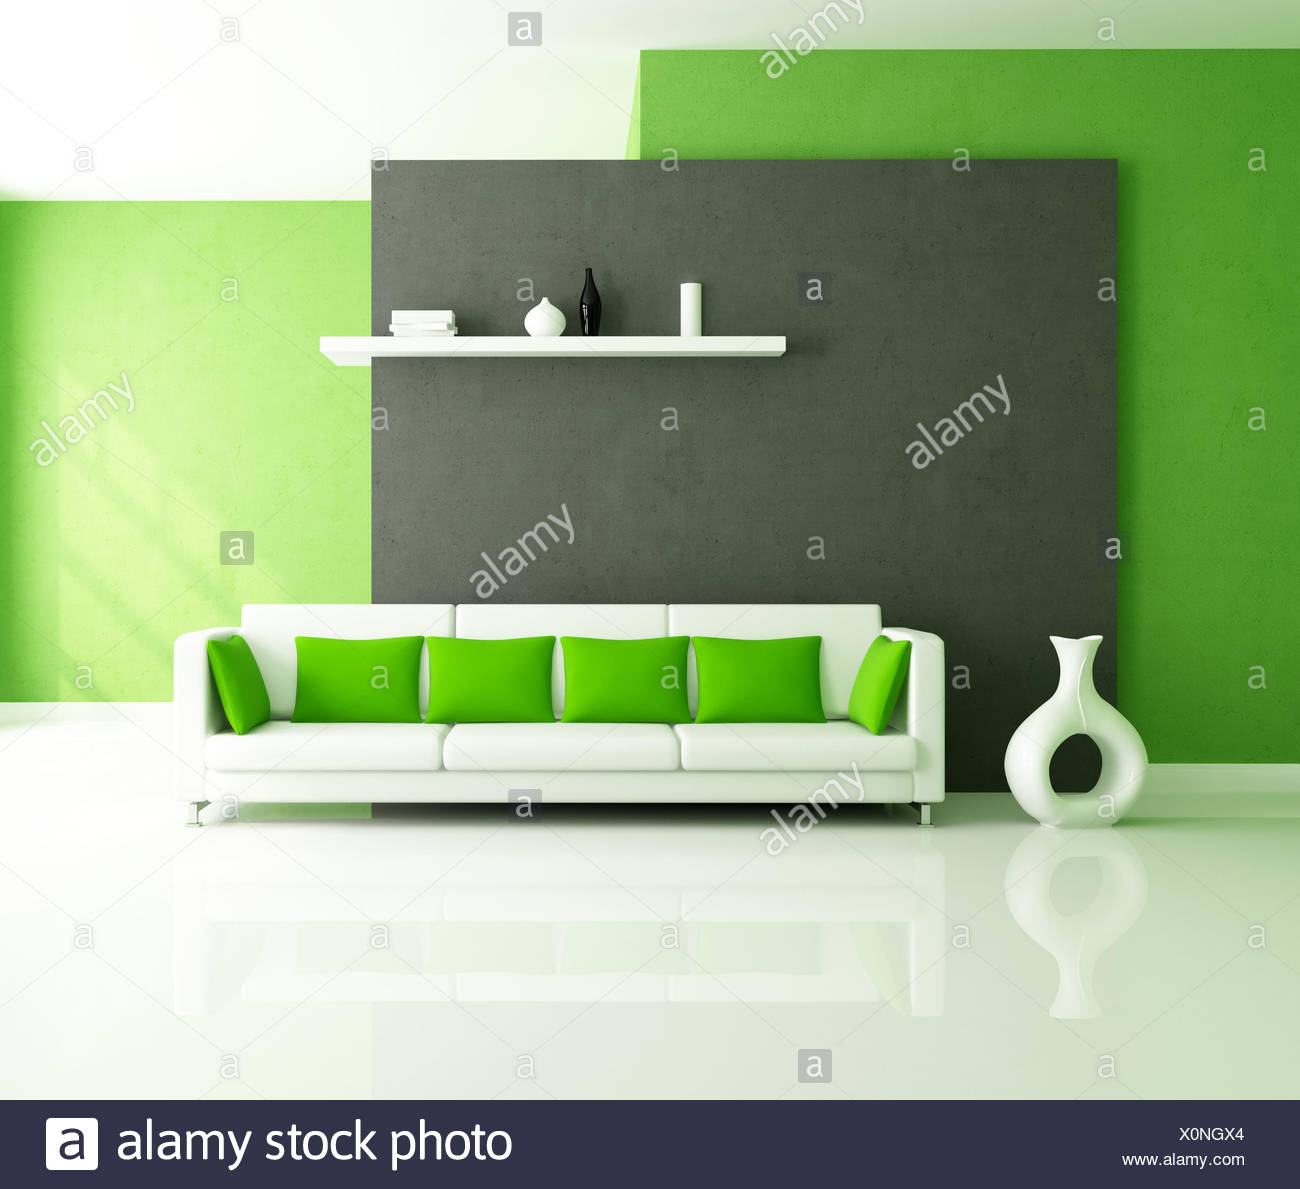 furniture modern modernity - Stock Image